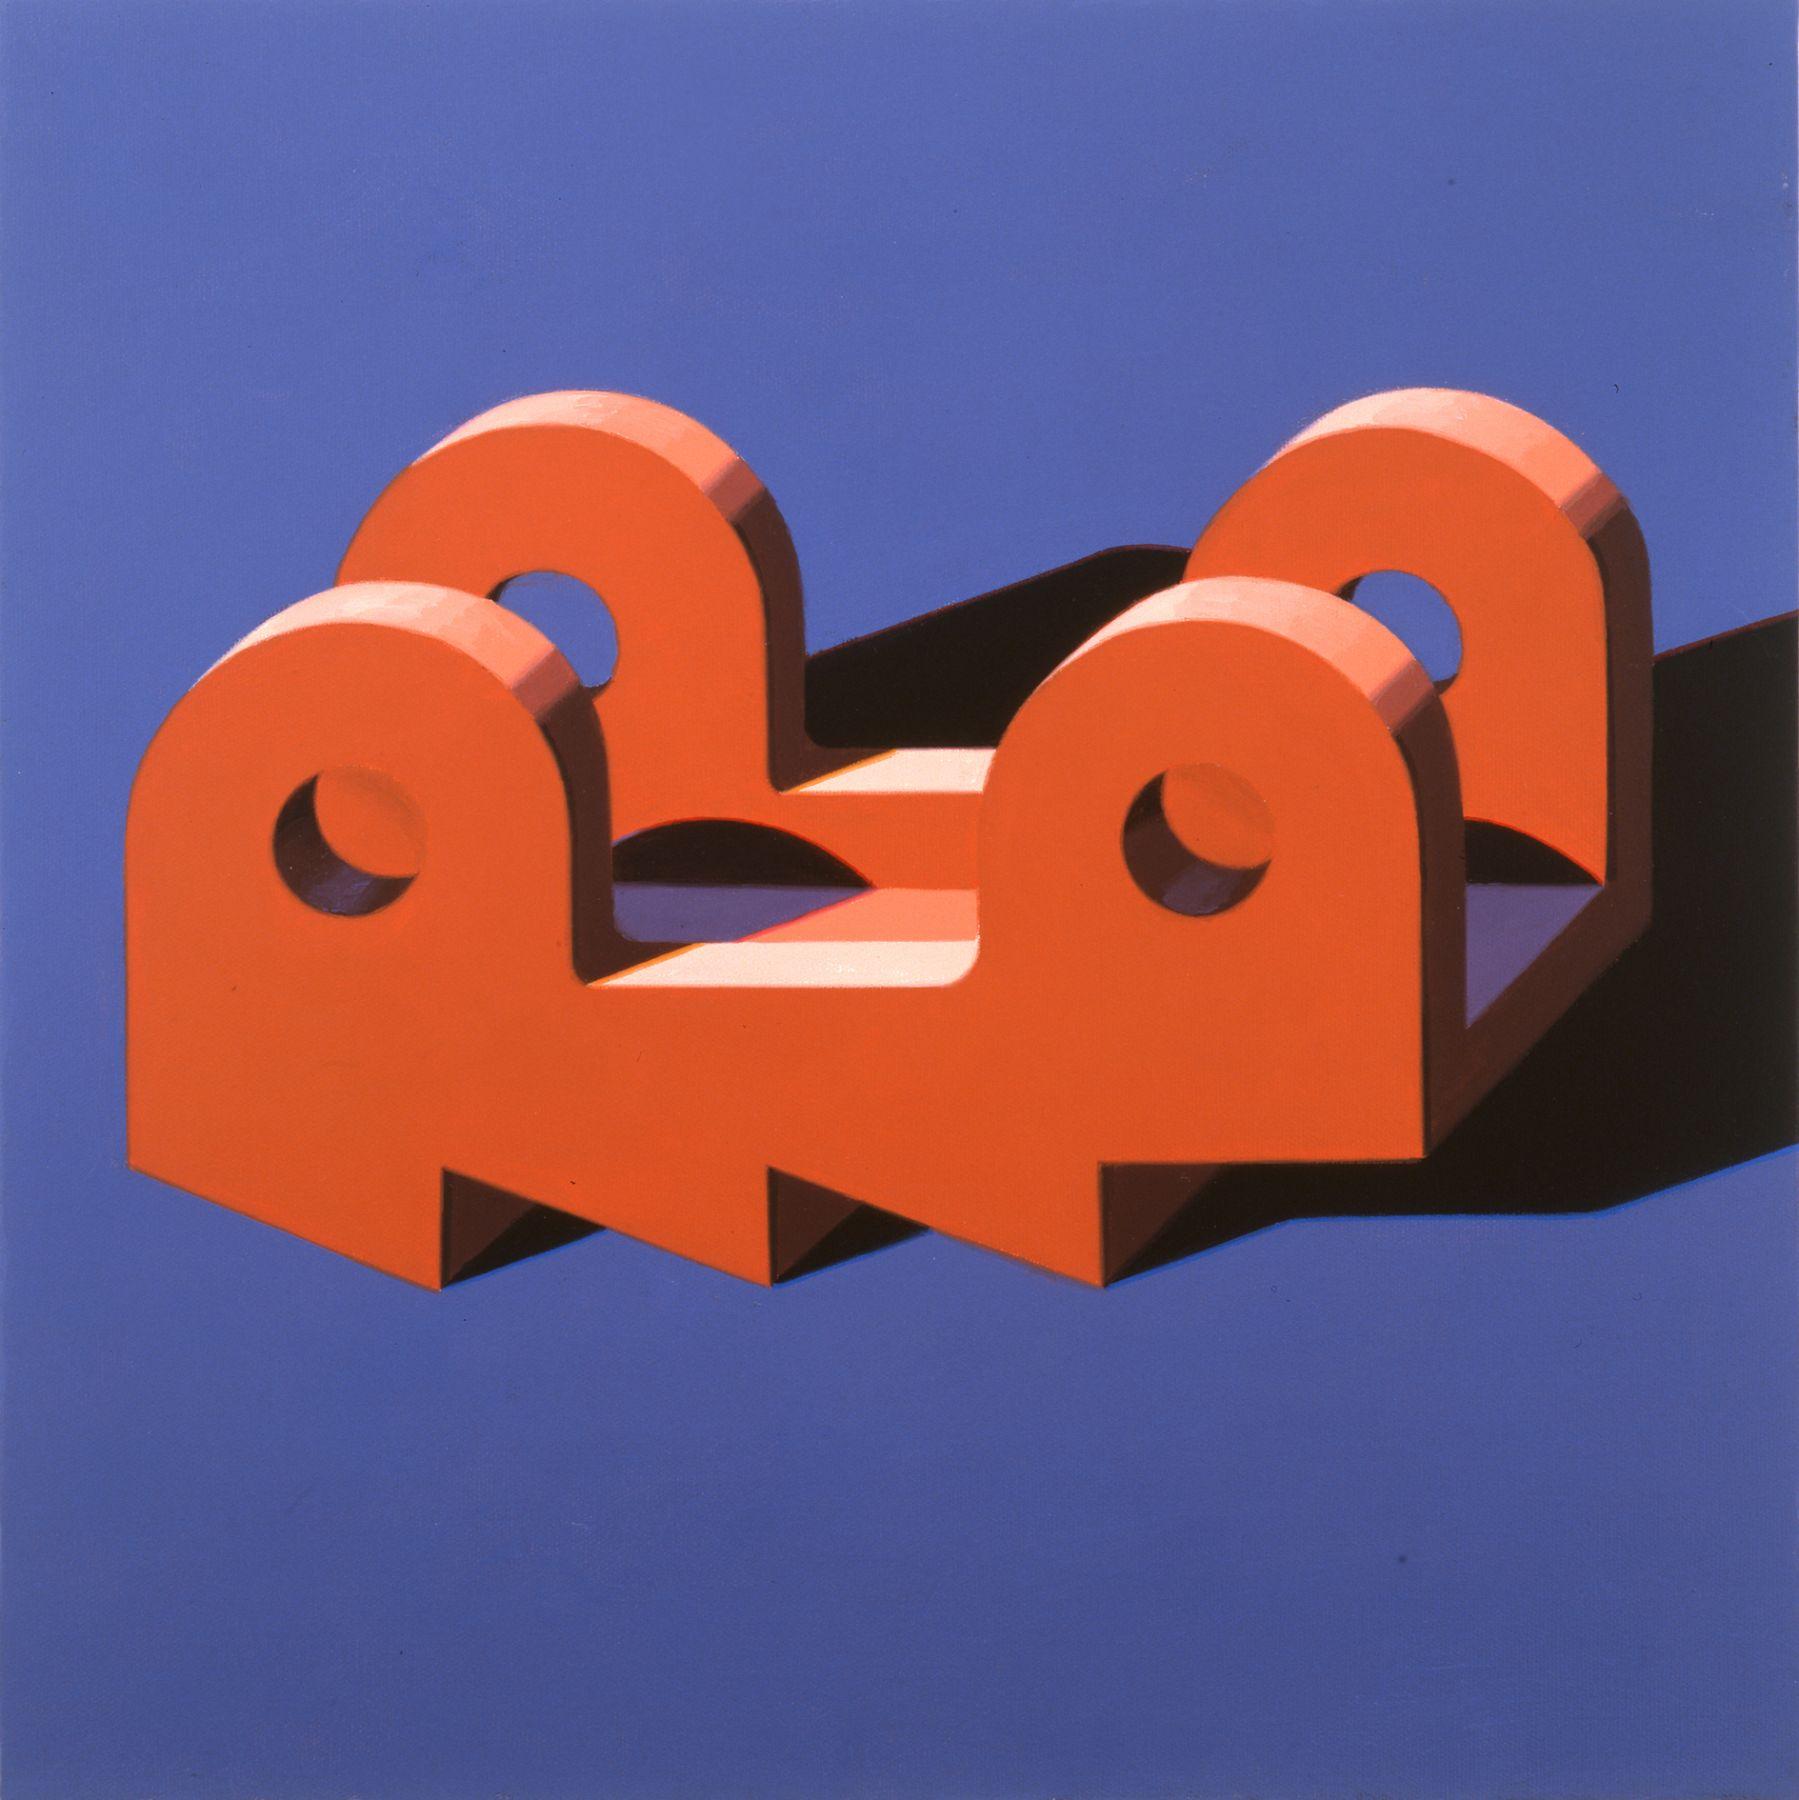 Robert Cottingham, Component IXX, 2005, gouache on paper, 5 1/2 x 5 1/2 inches